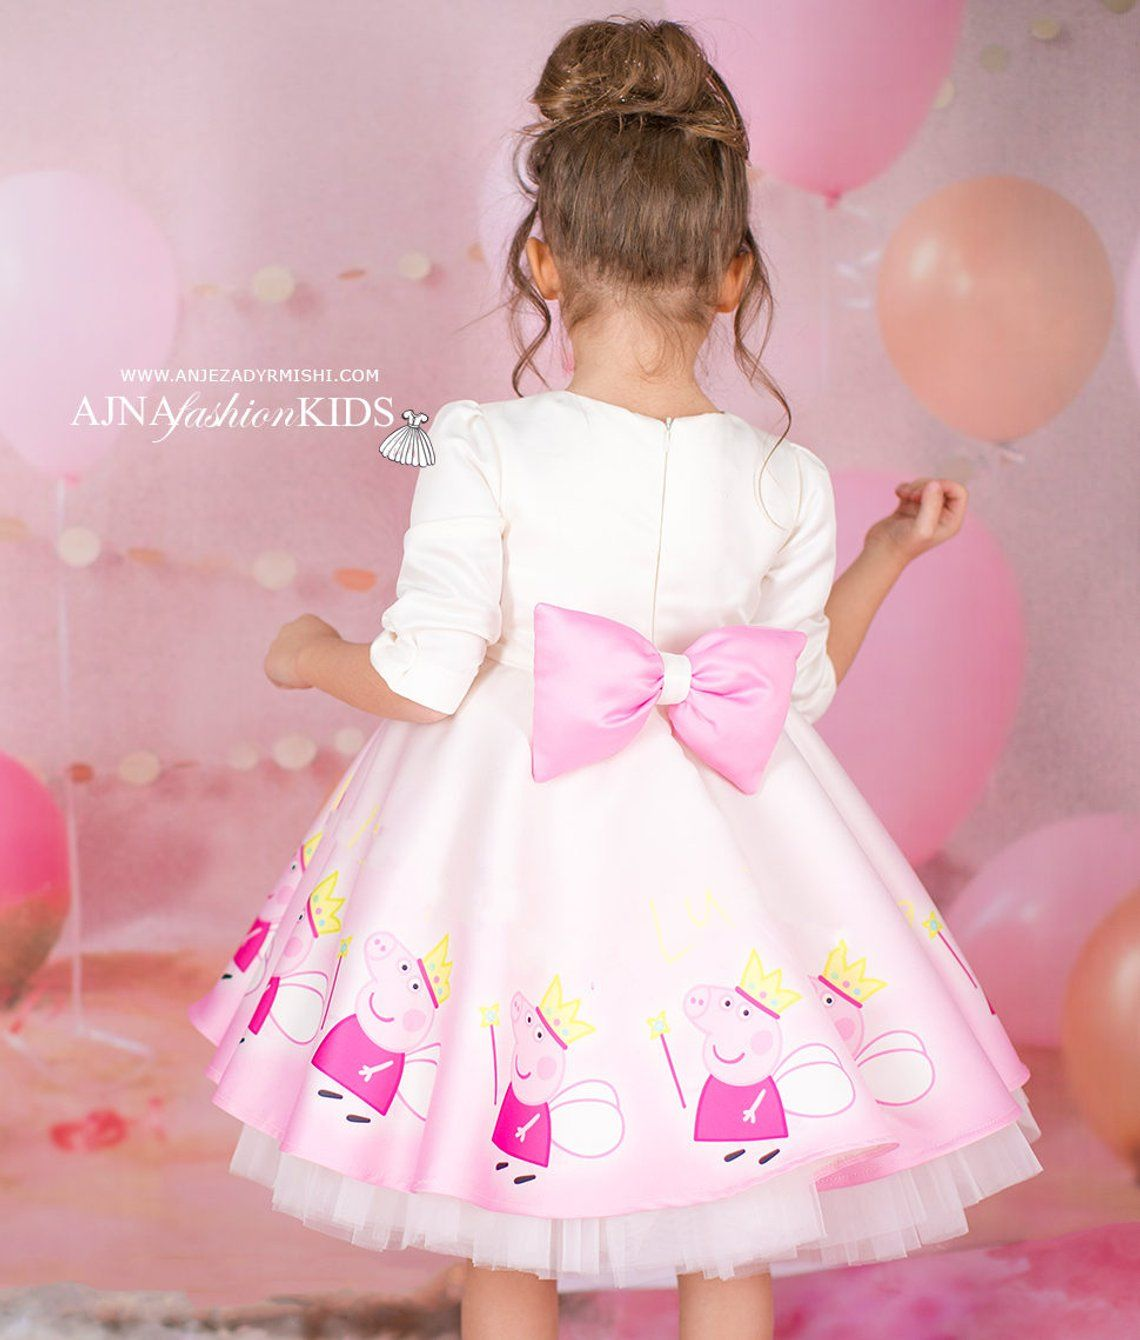 Peppa pig dress , peppa pig birthday, peppa pig birthday dress, peppa pig costume